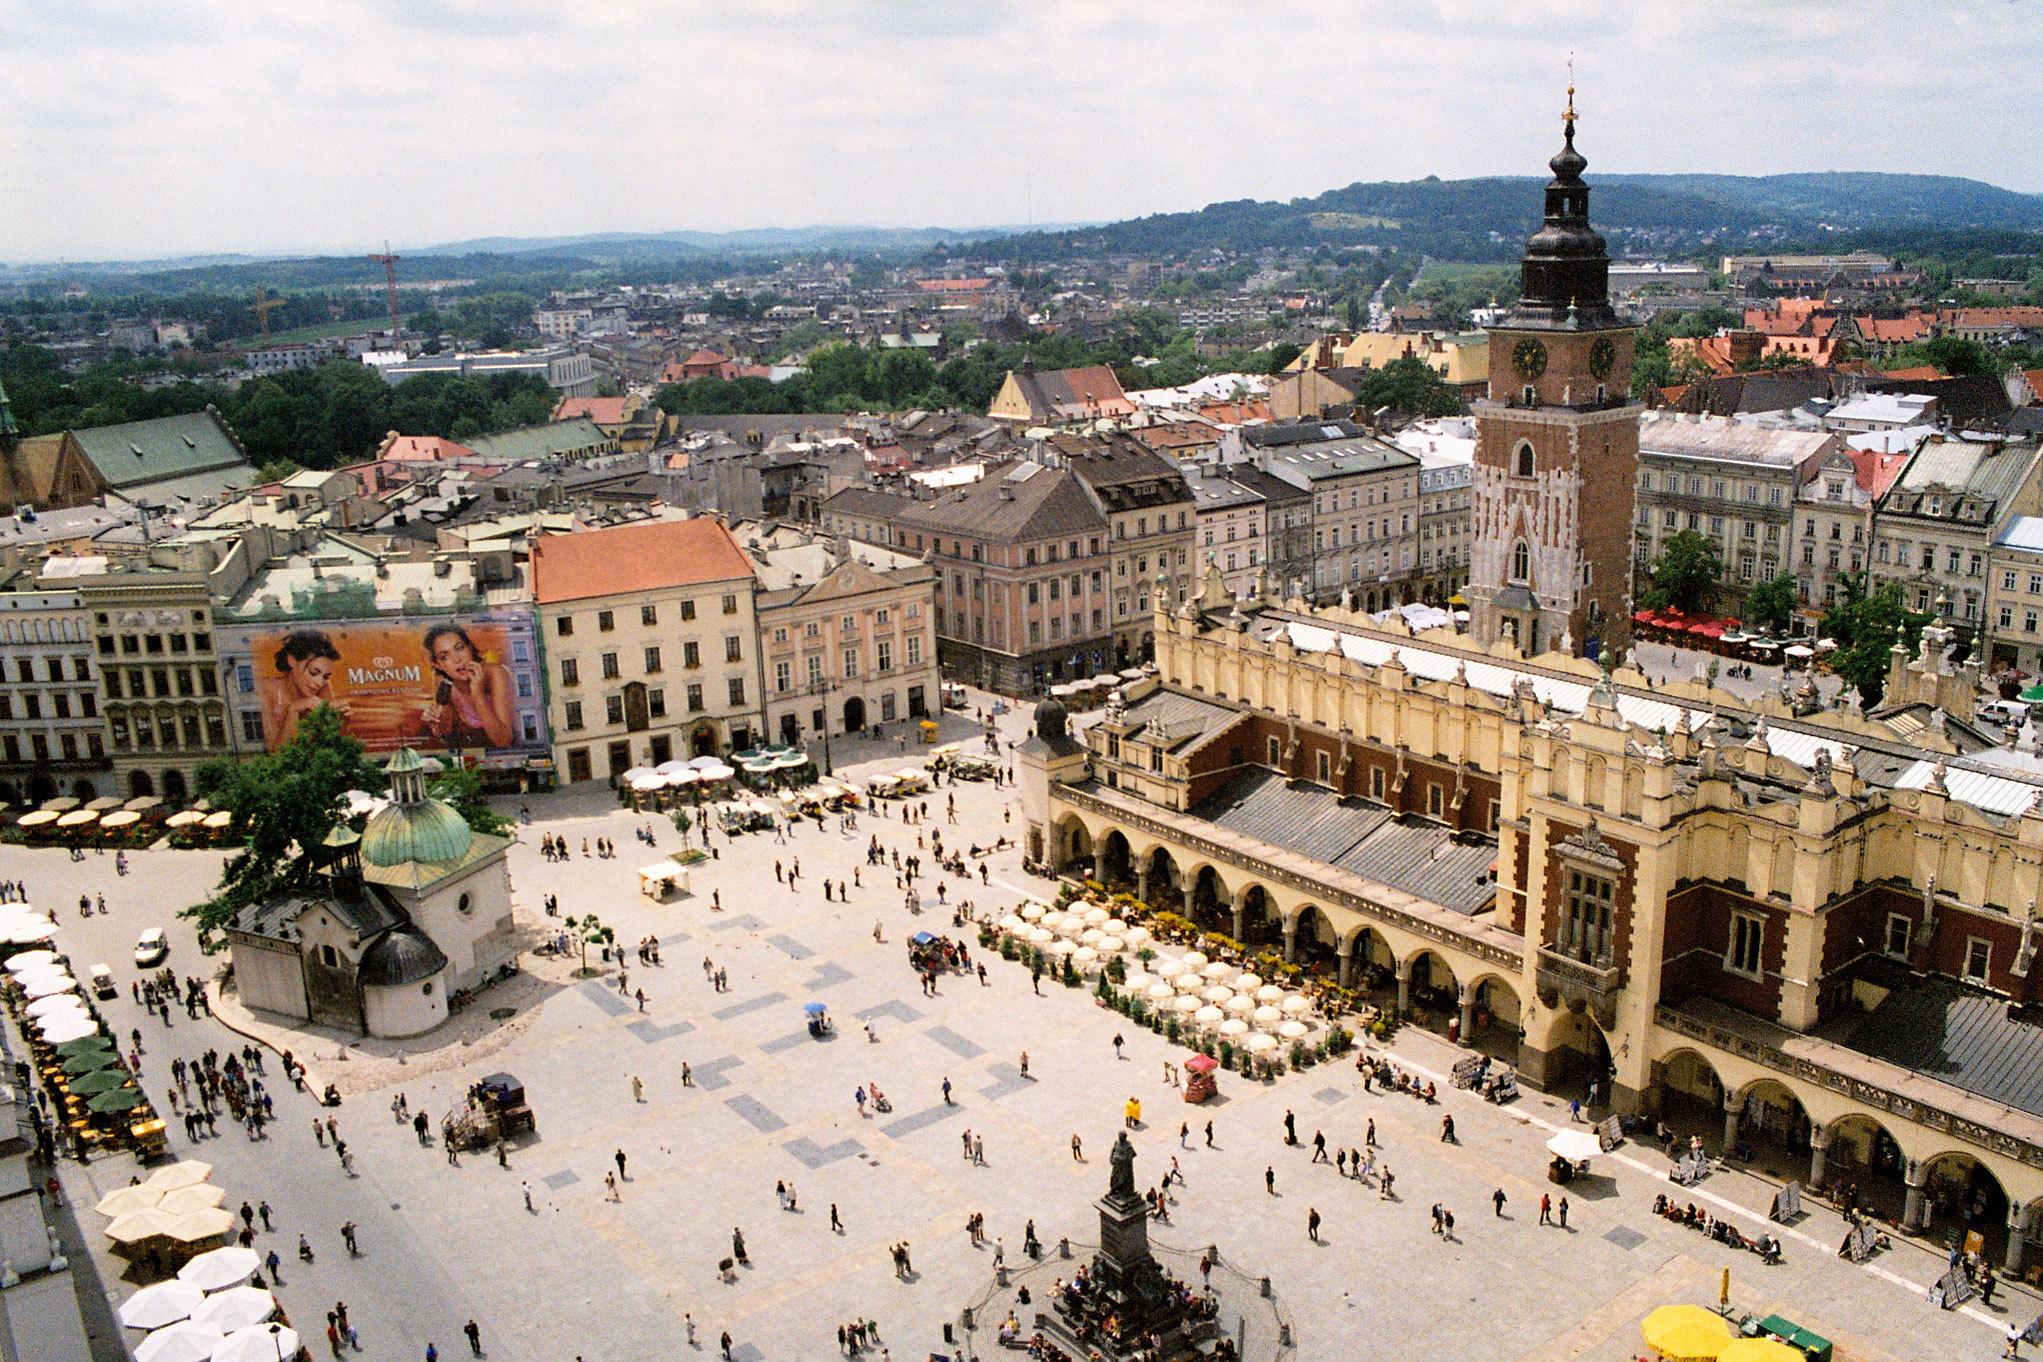 Main Market Square - Krakow Photo (6662394) - Fanpop